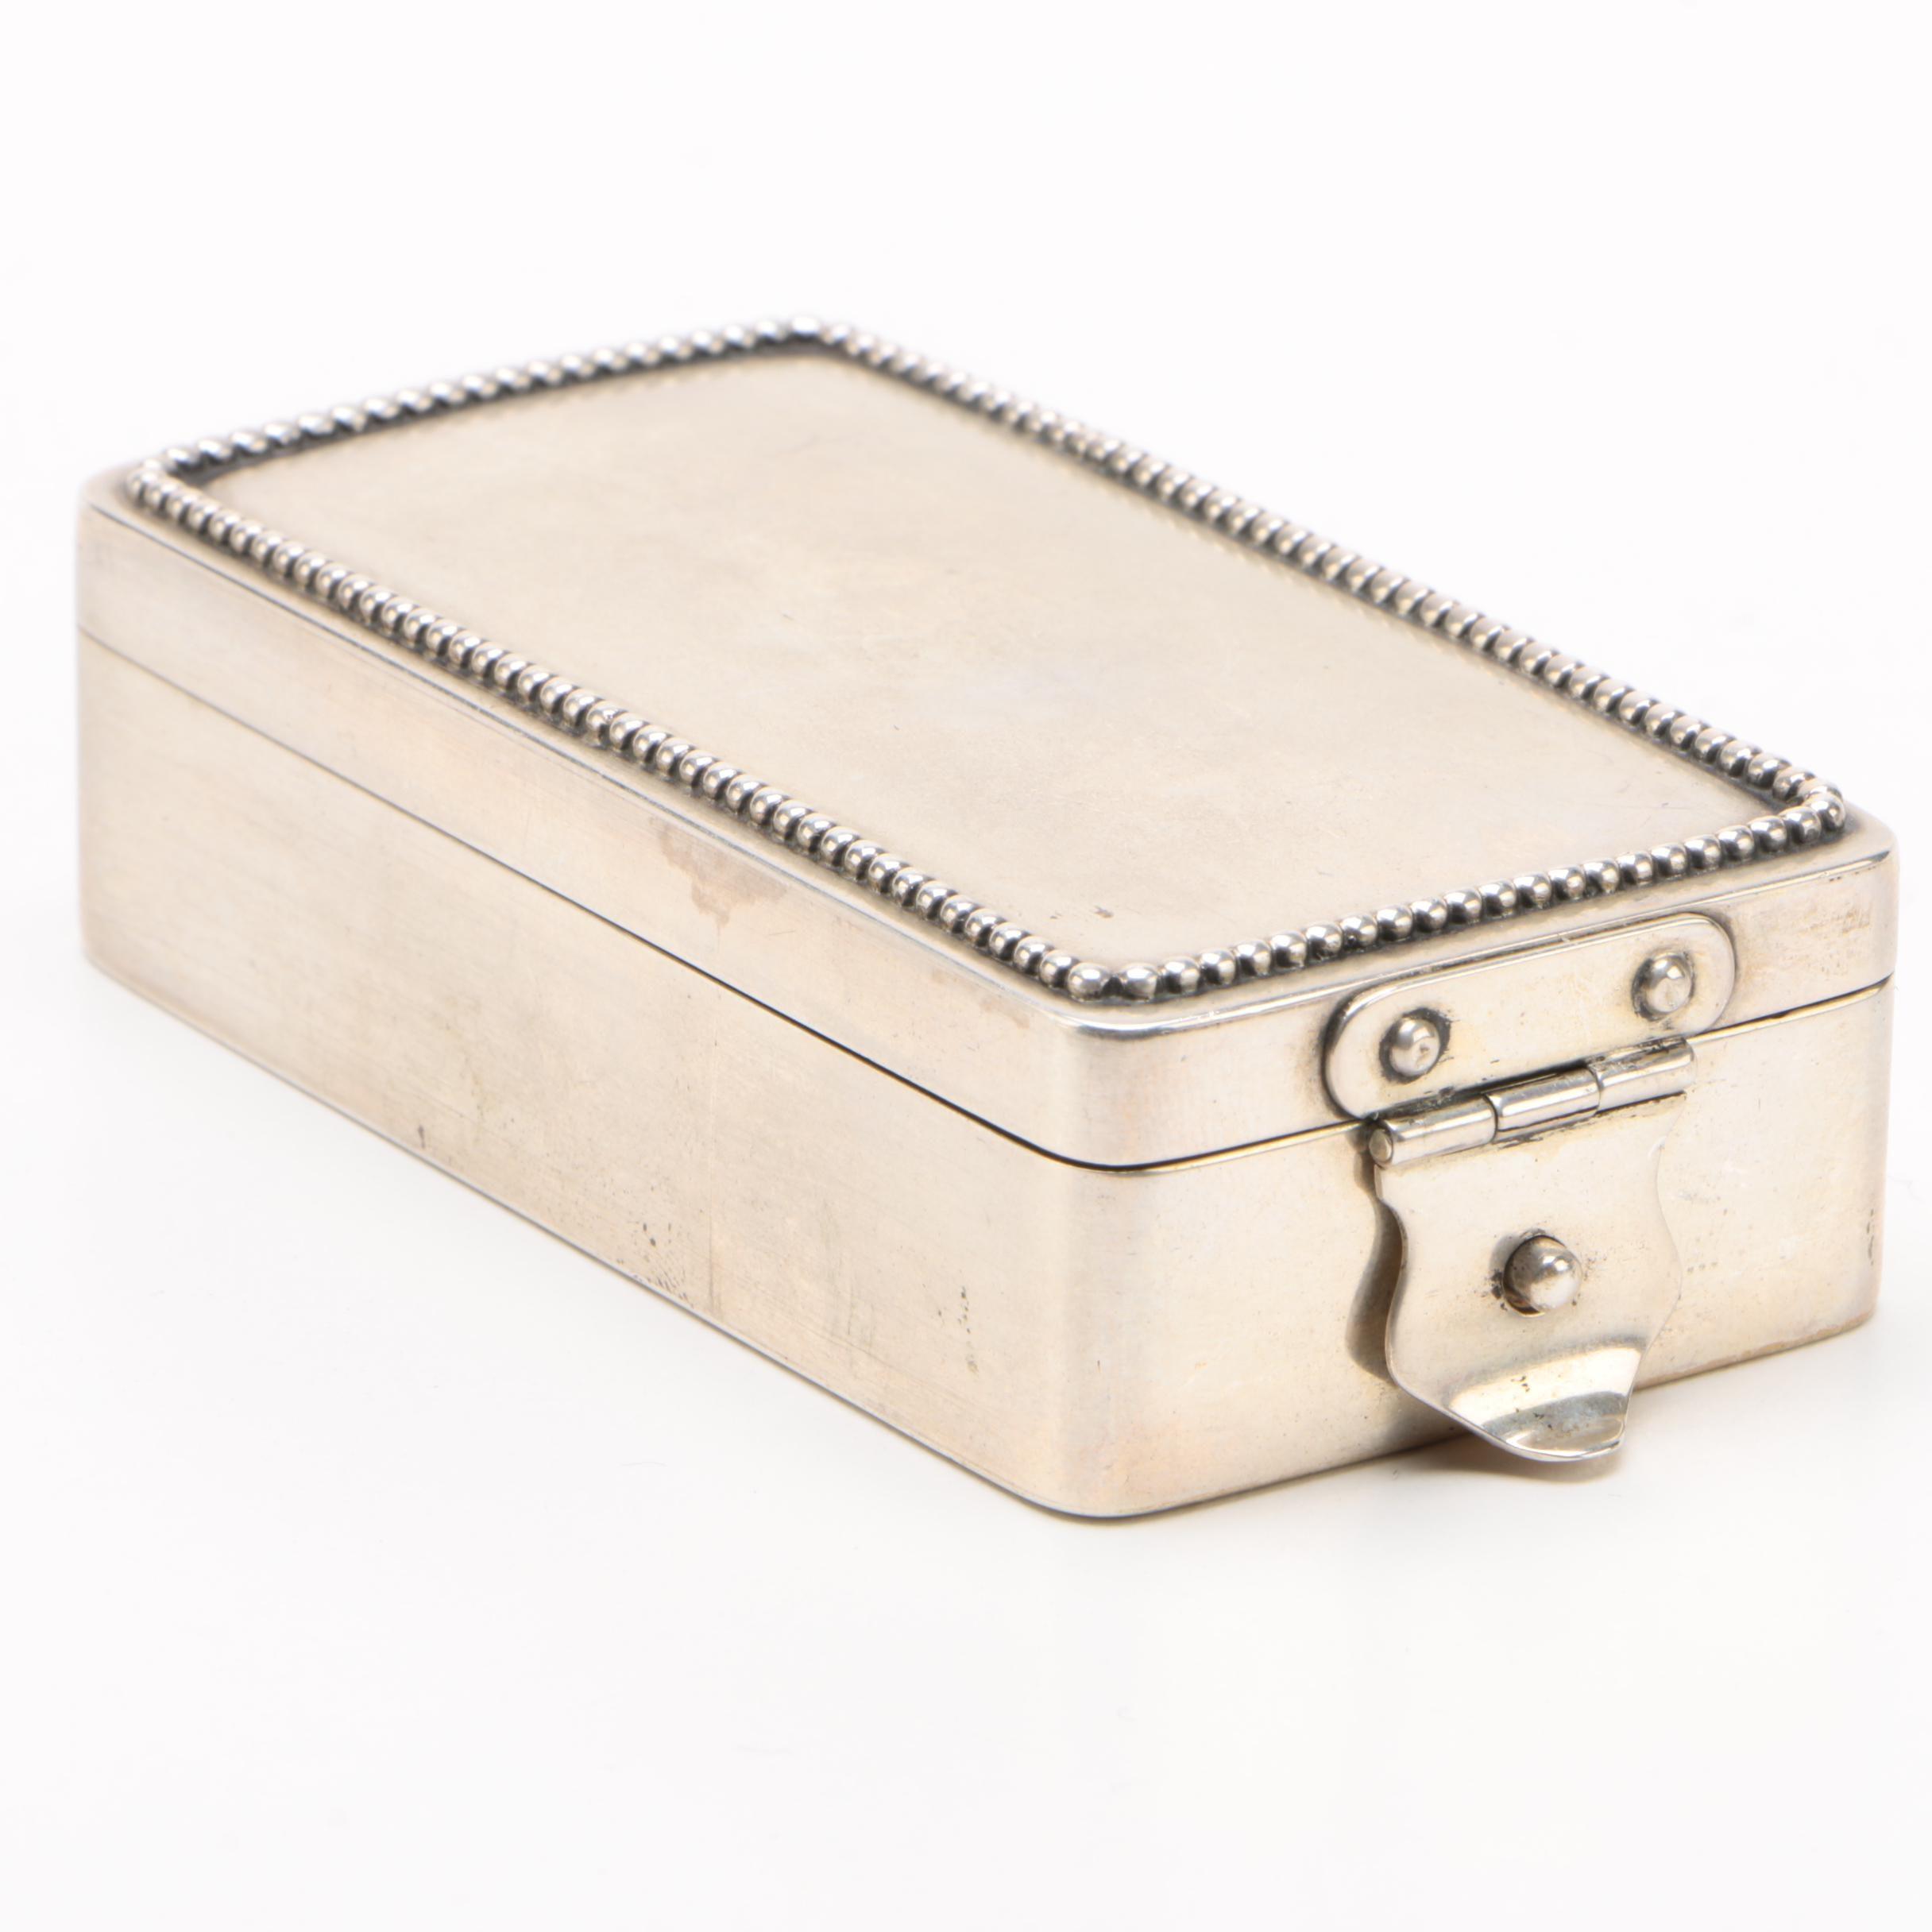 I. Paulsen of Copenhagen 825 Silver Snuff Box, 1918